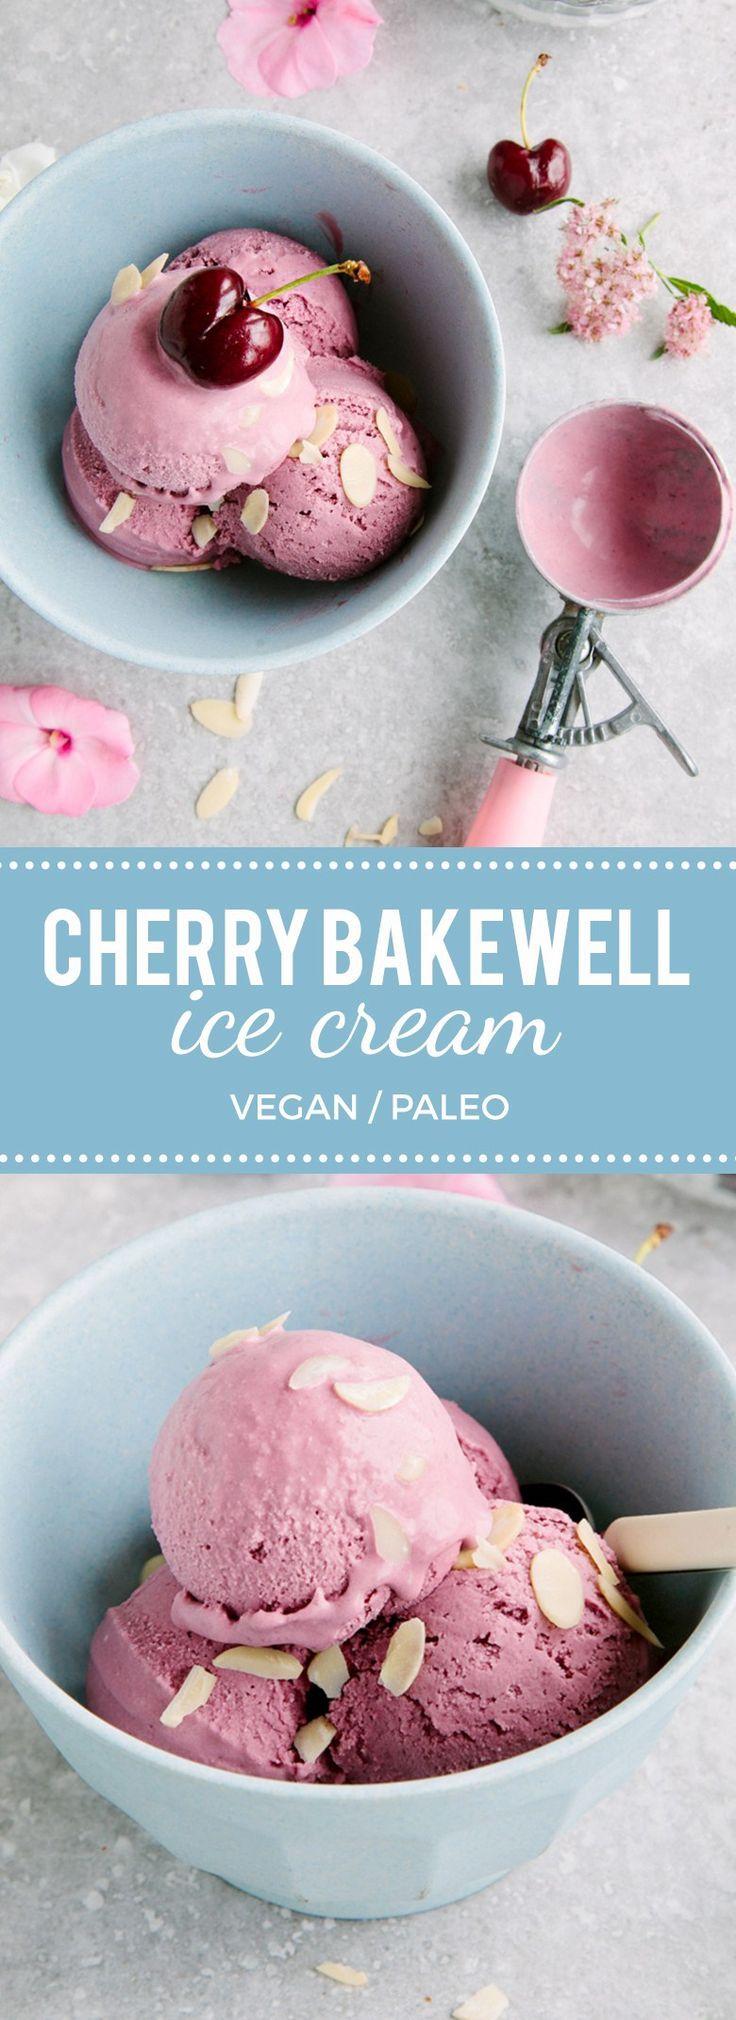 Cherry Bakewell Ice Cream (Vegan + Paleo)                                                                                                                                                                                 More